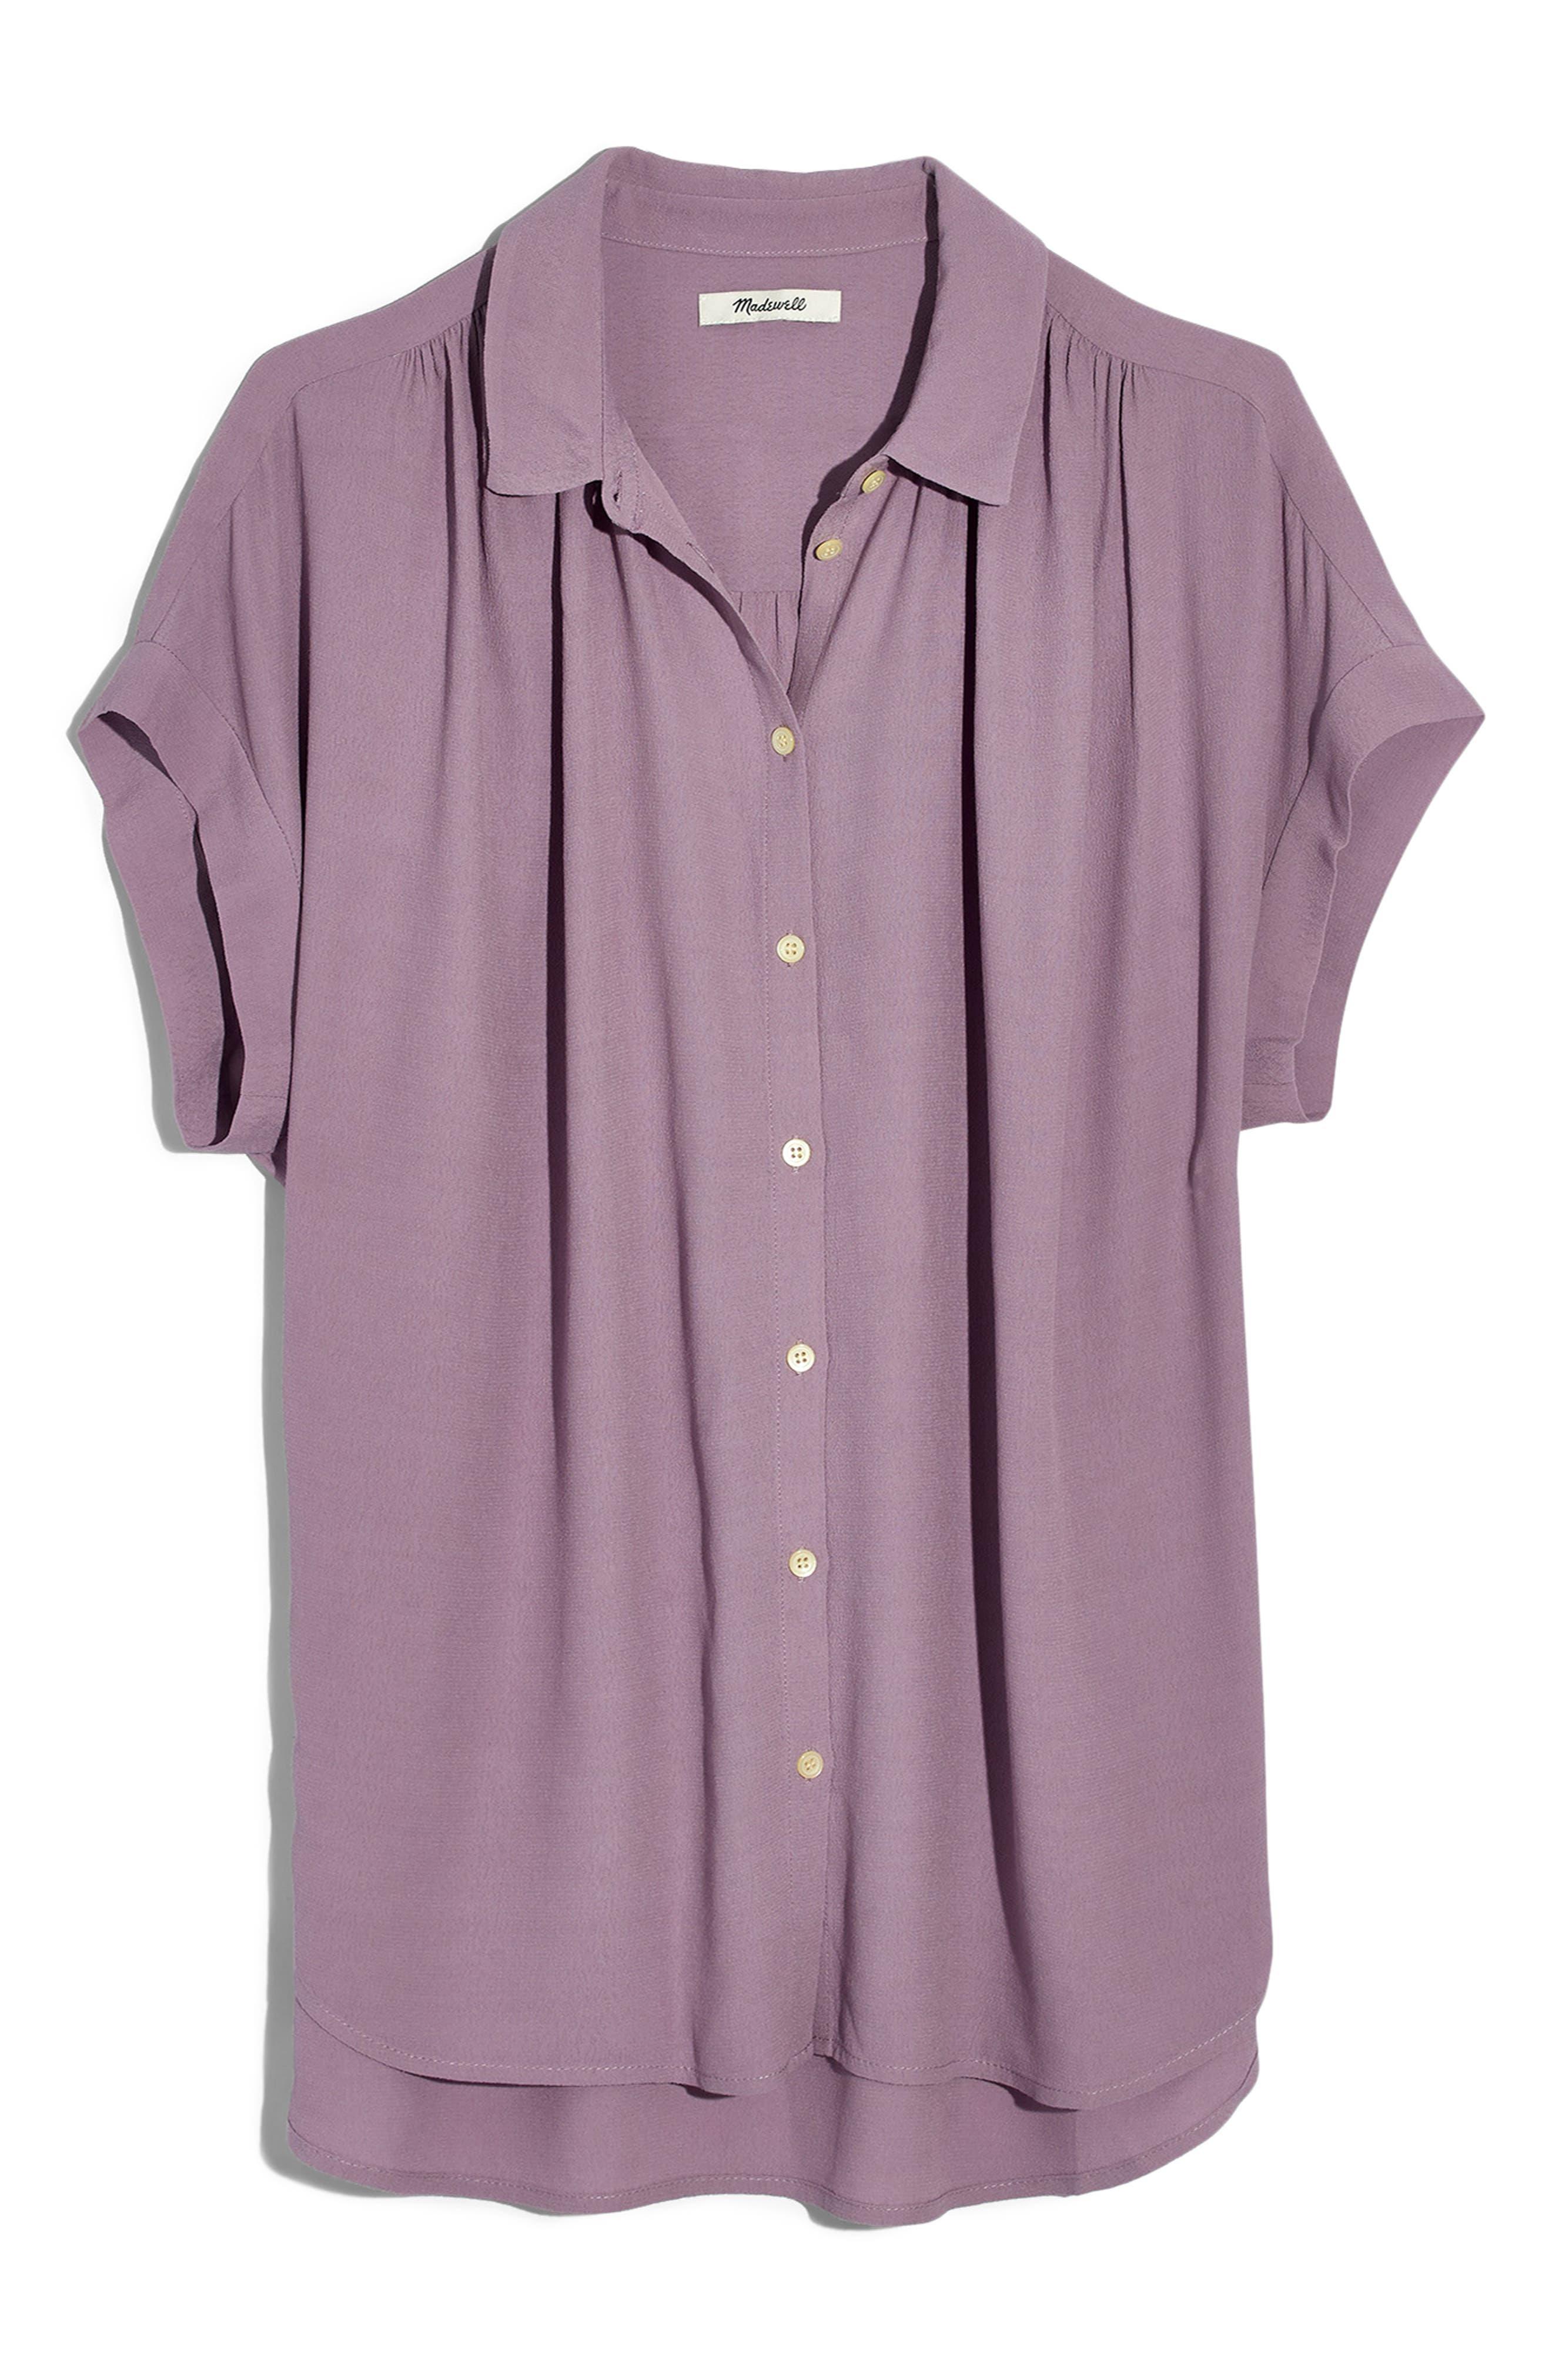 MADEWELL,                             Central Drapey Shirt,                             Main thumbnail 1, color,                             SERENE LAVENDAR